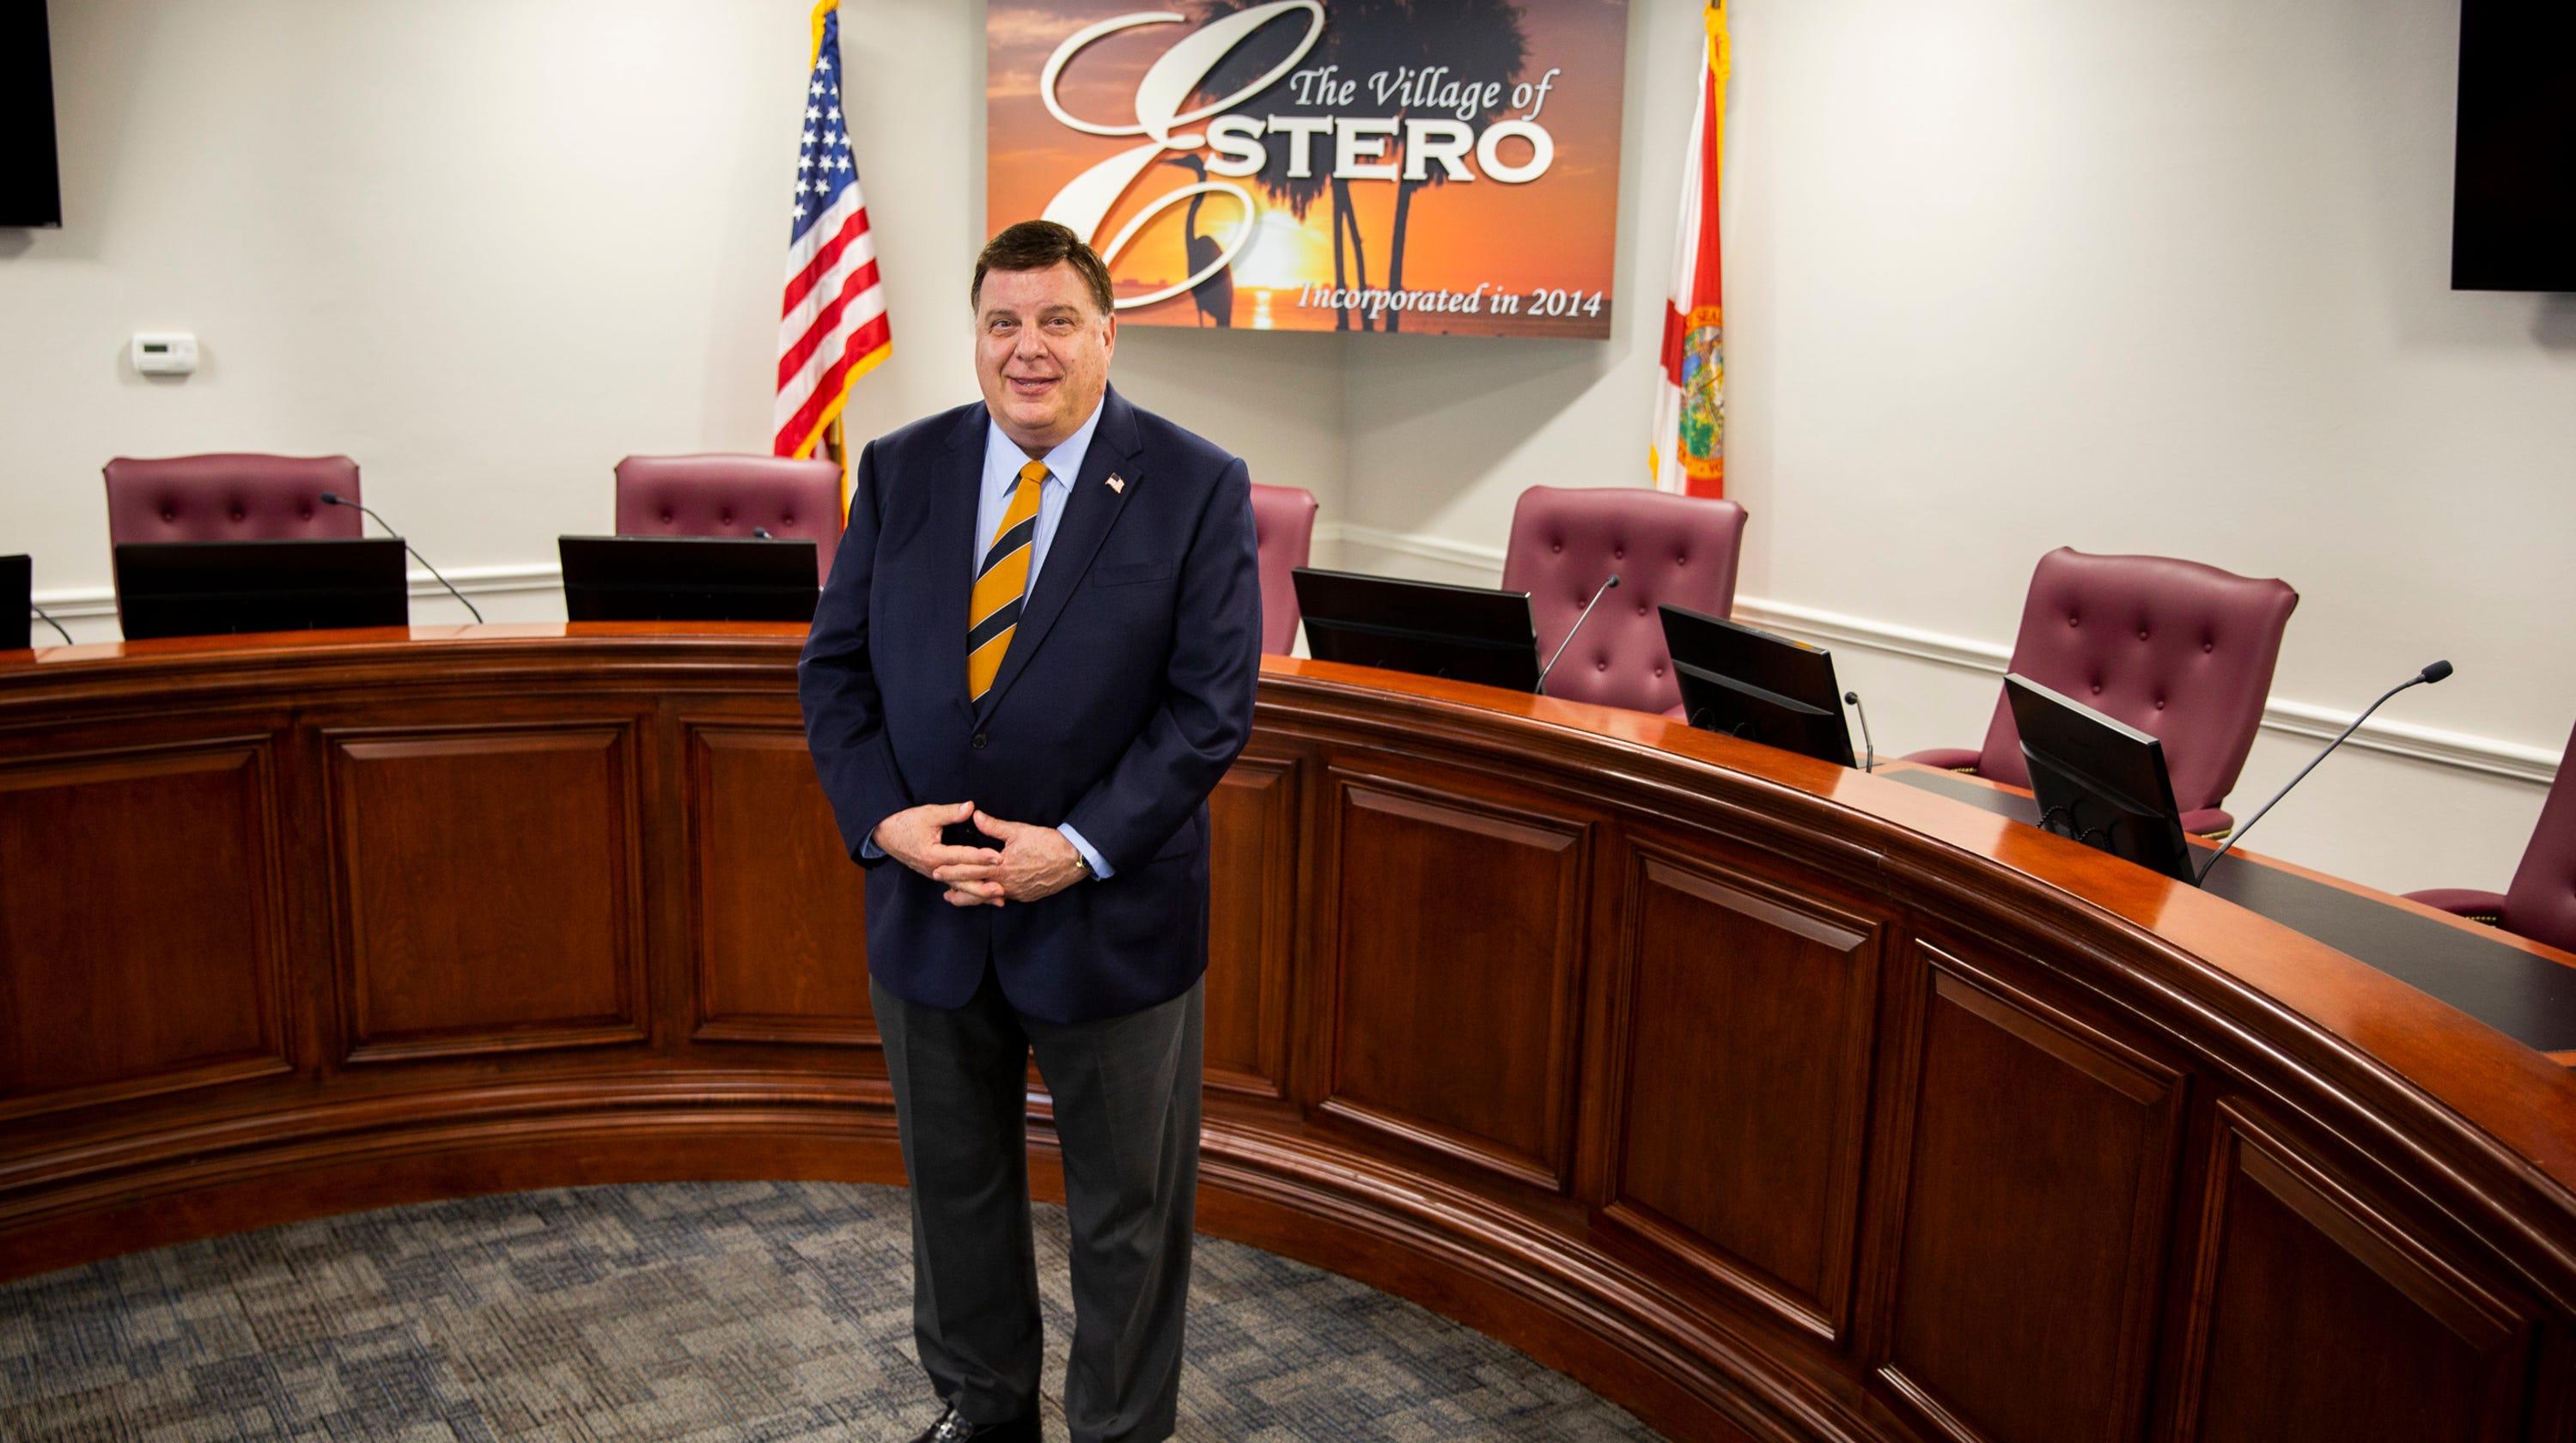 Former UPS Executive Bill Ribble Serving As Mayor Of Estero